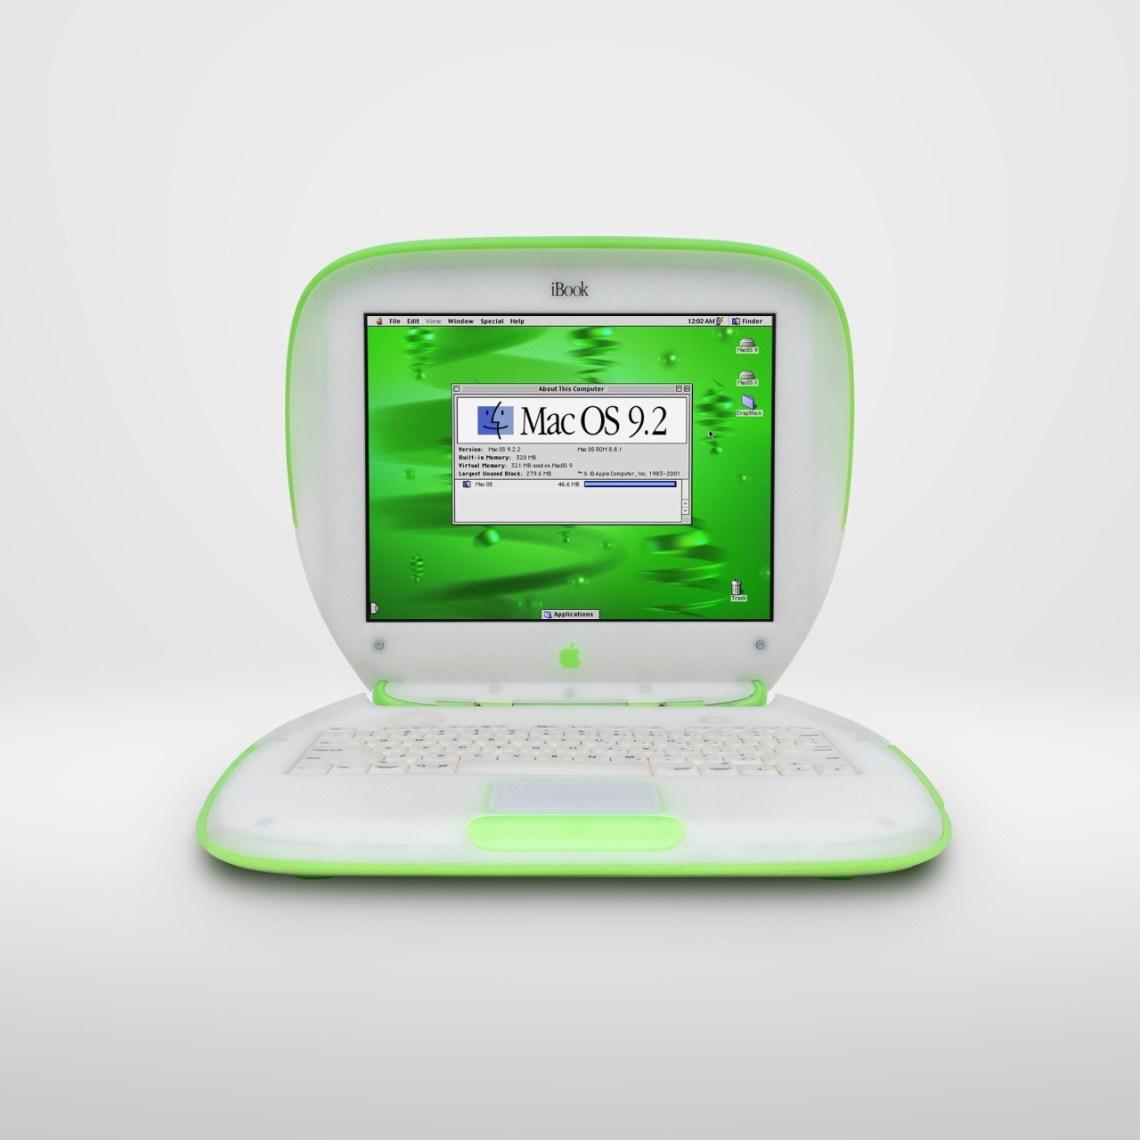 ibook g3.jpg